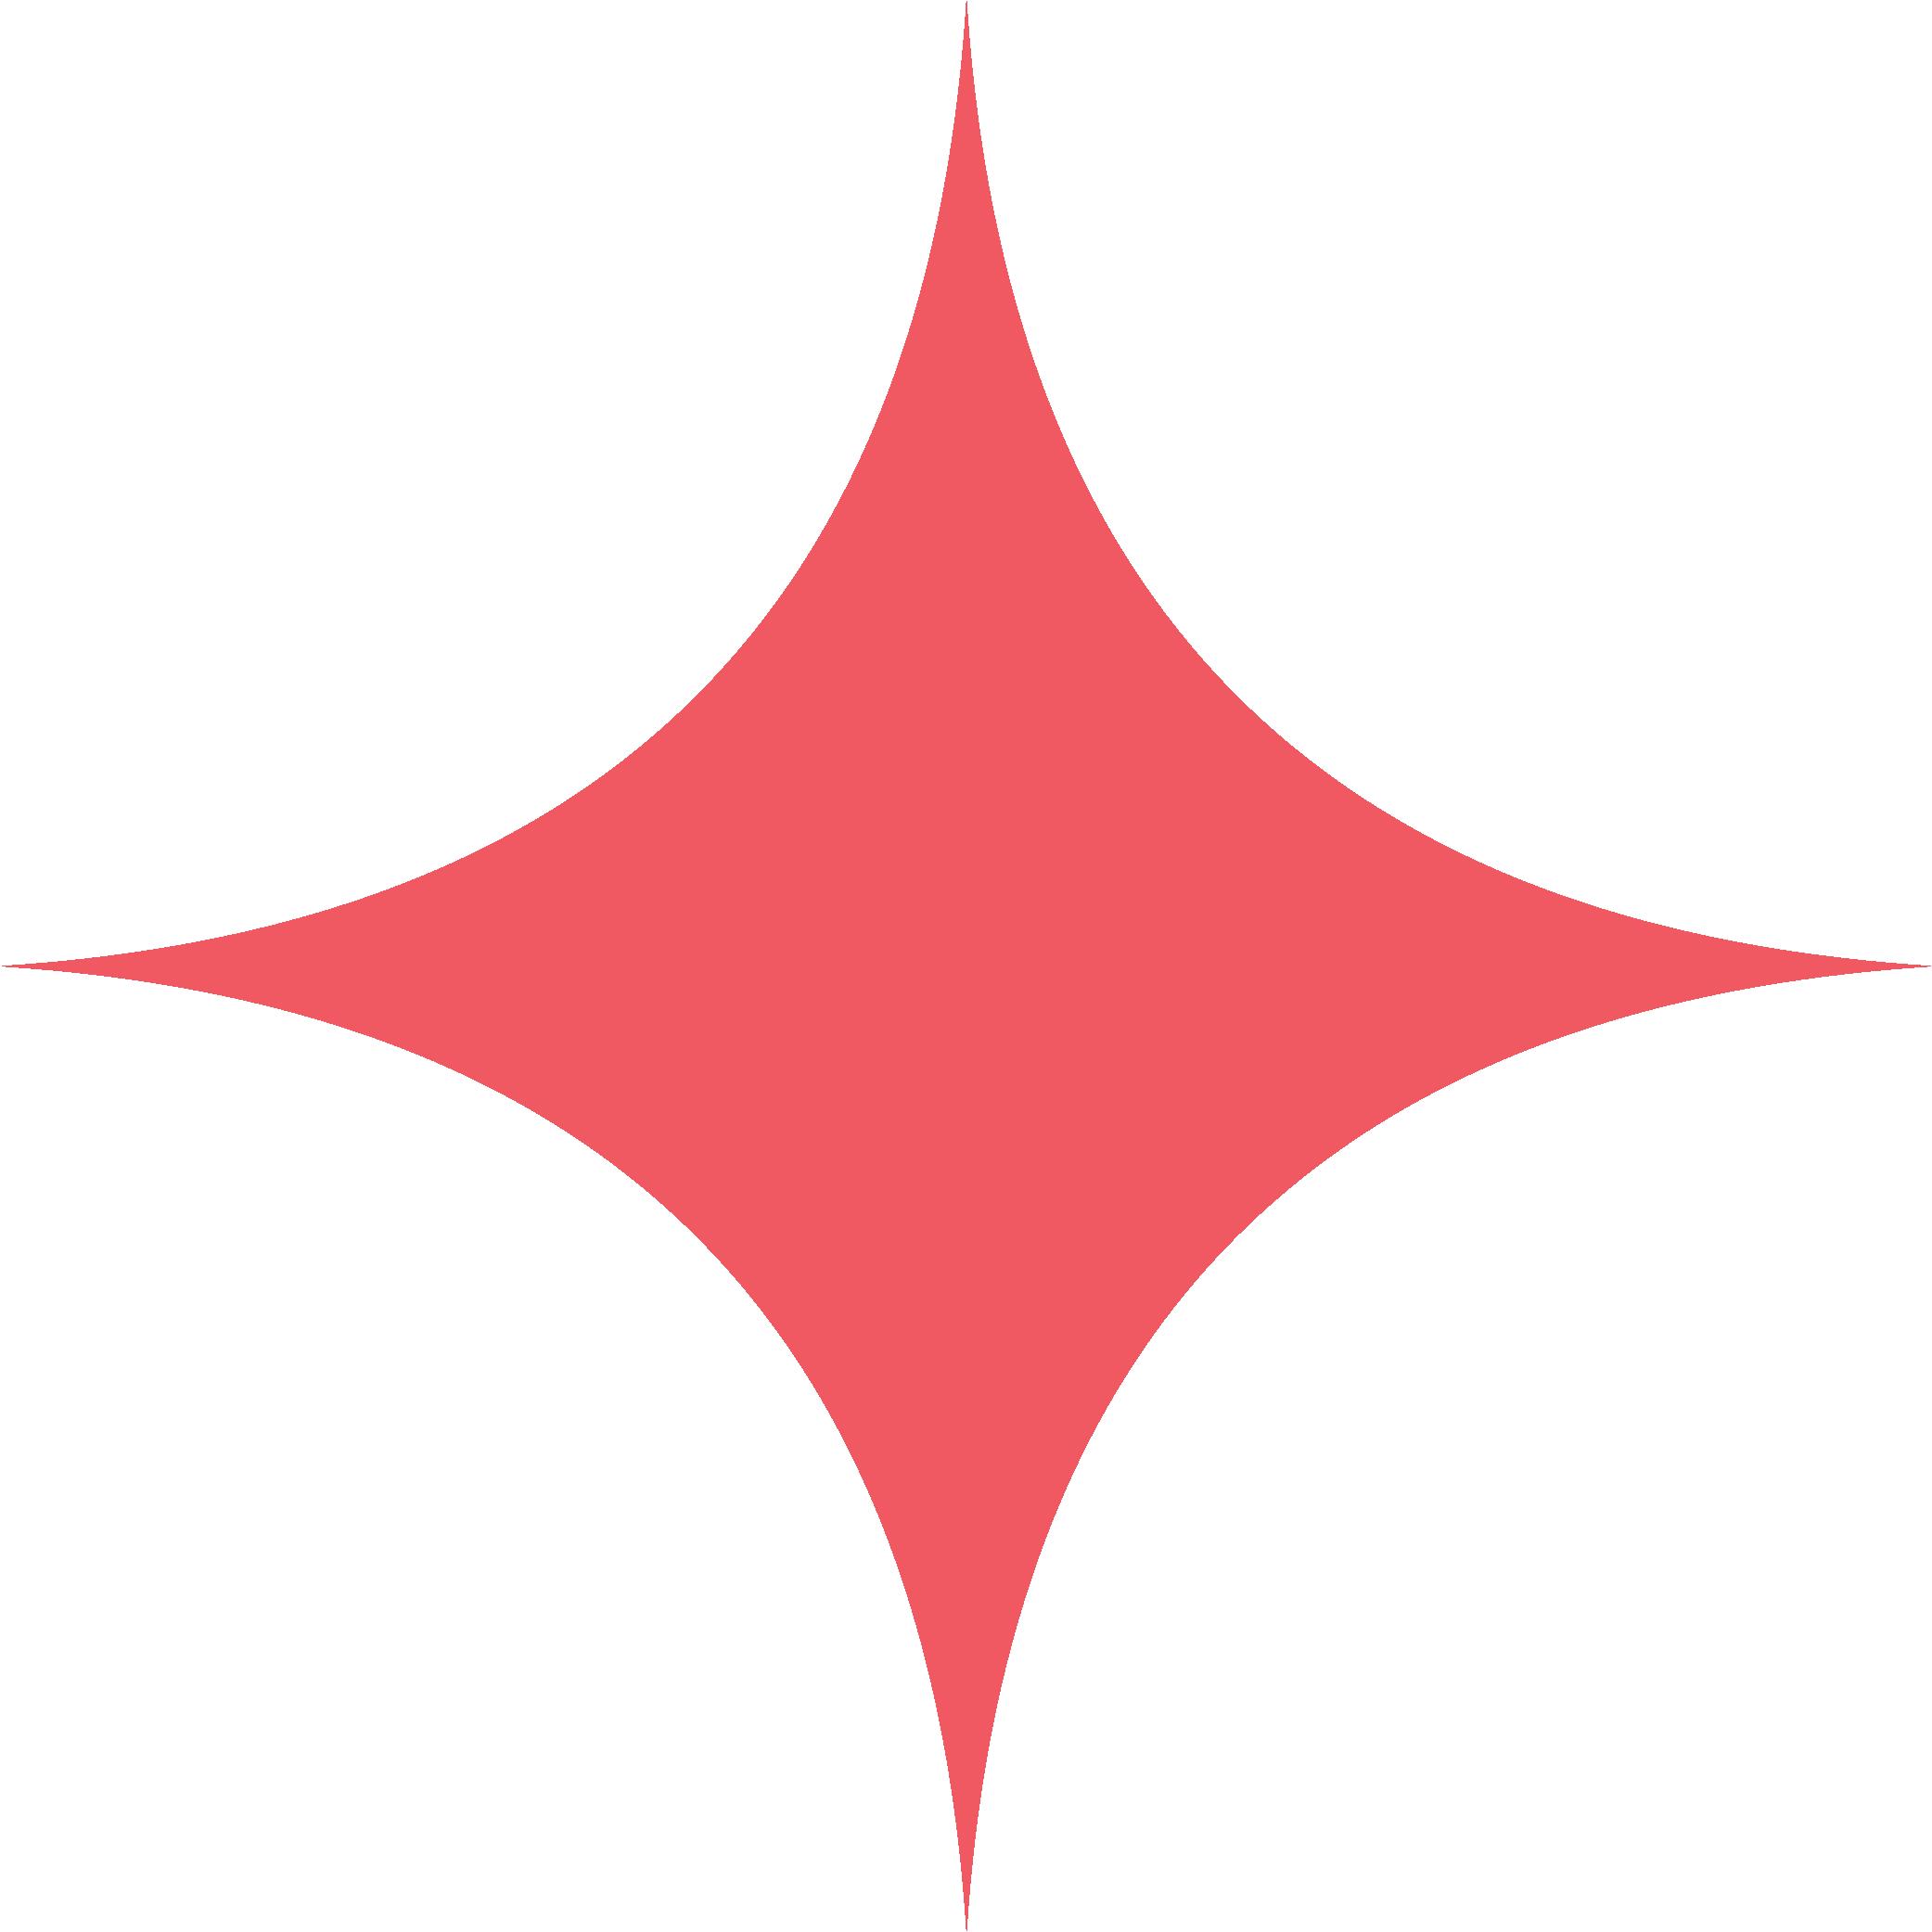 SFU003_SparkElement_Pink_CMYK.png